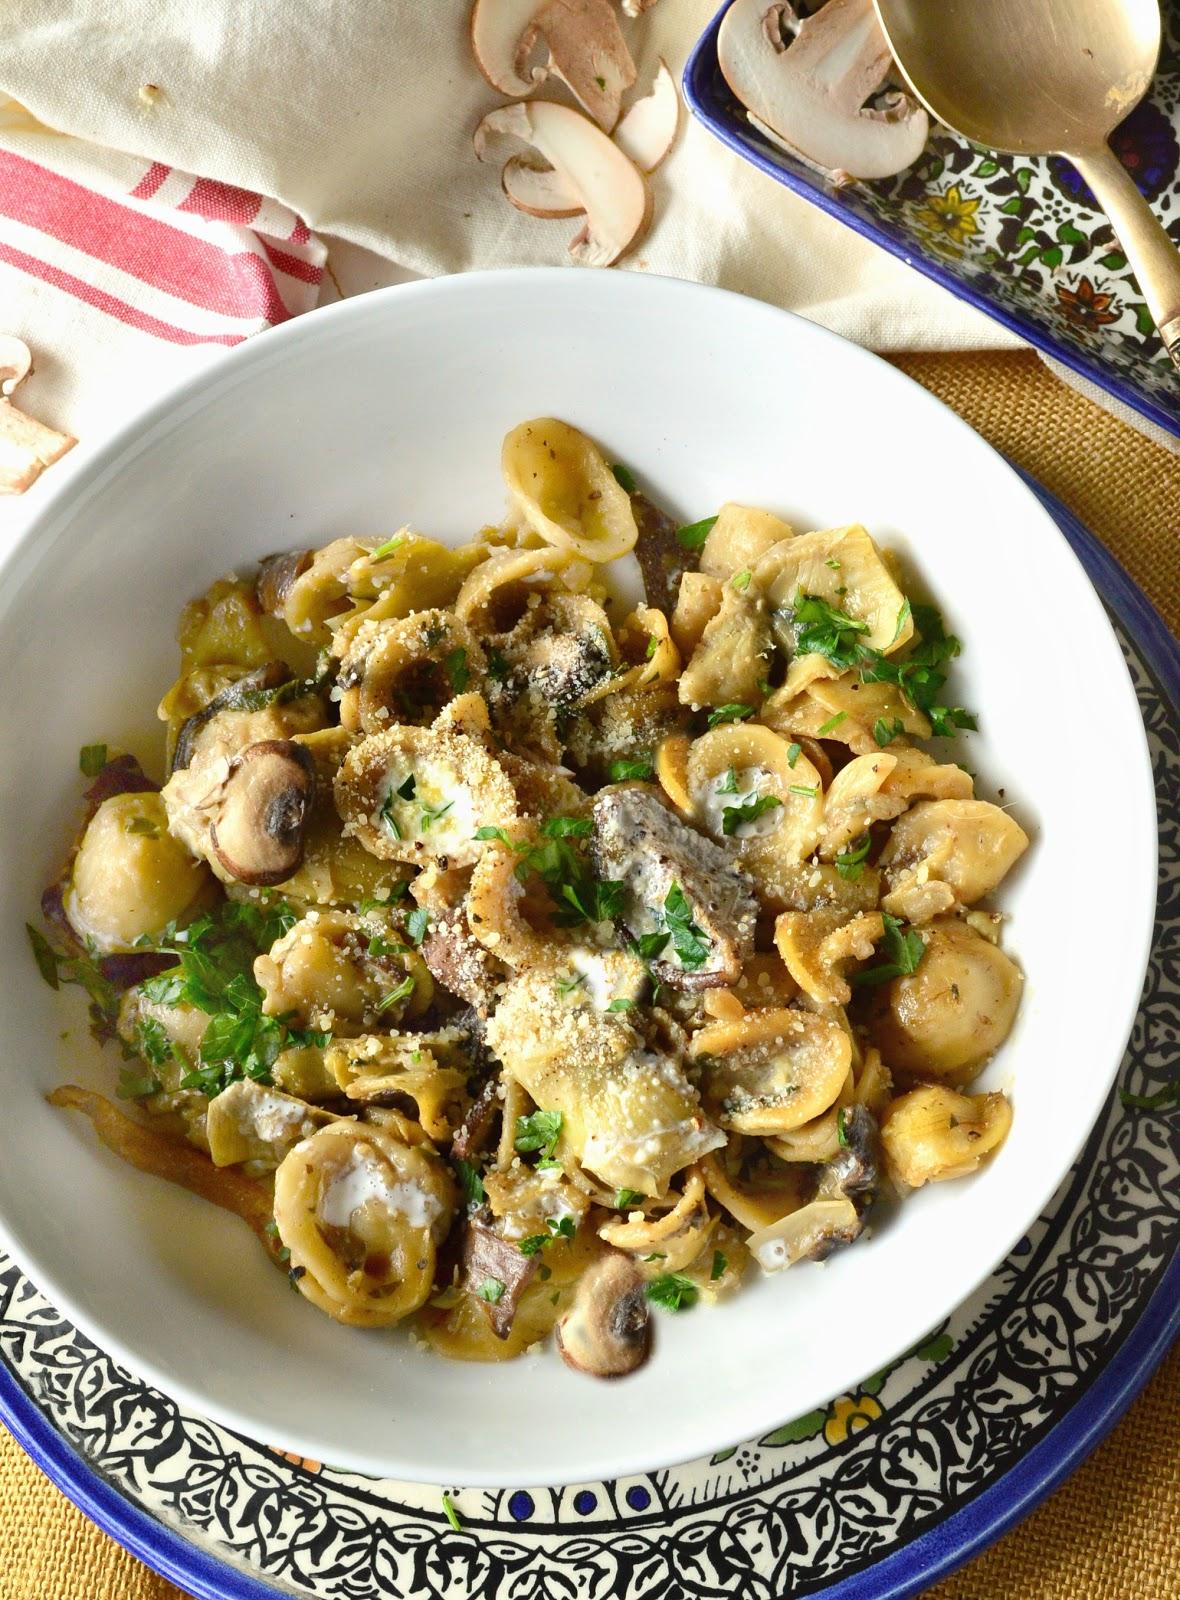 pasta, artichokes, mushroom, bowl